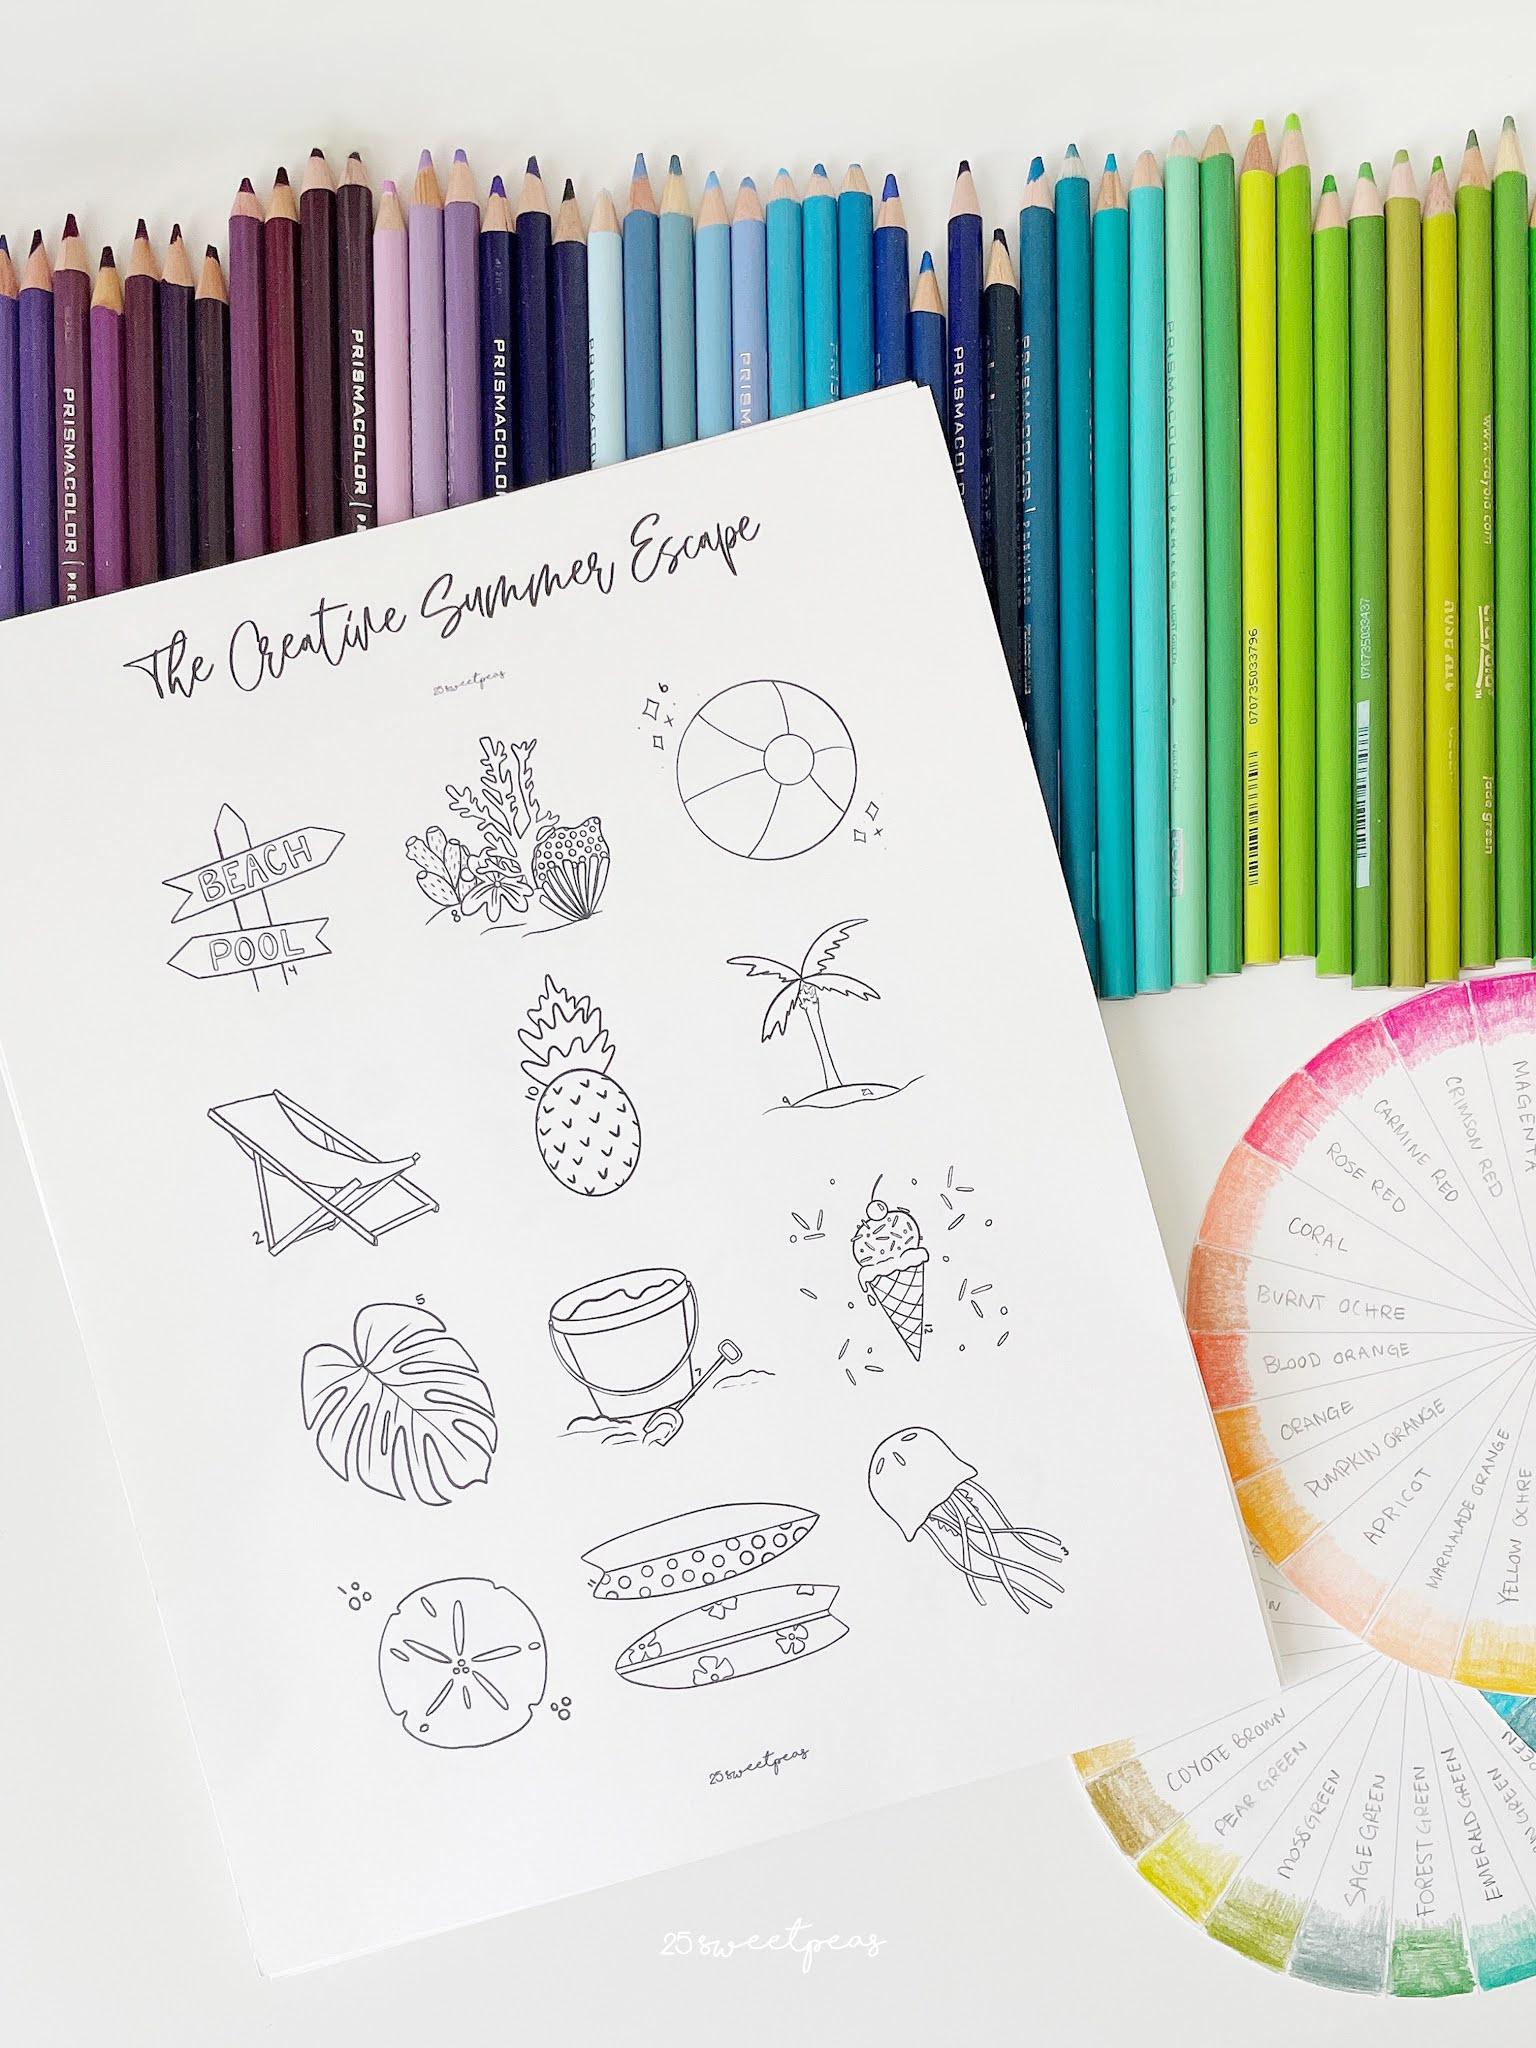 25 Sweetpeas The Creative Summer Escape